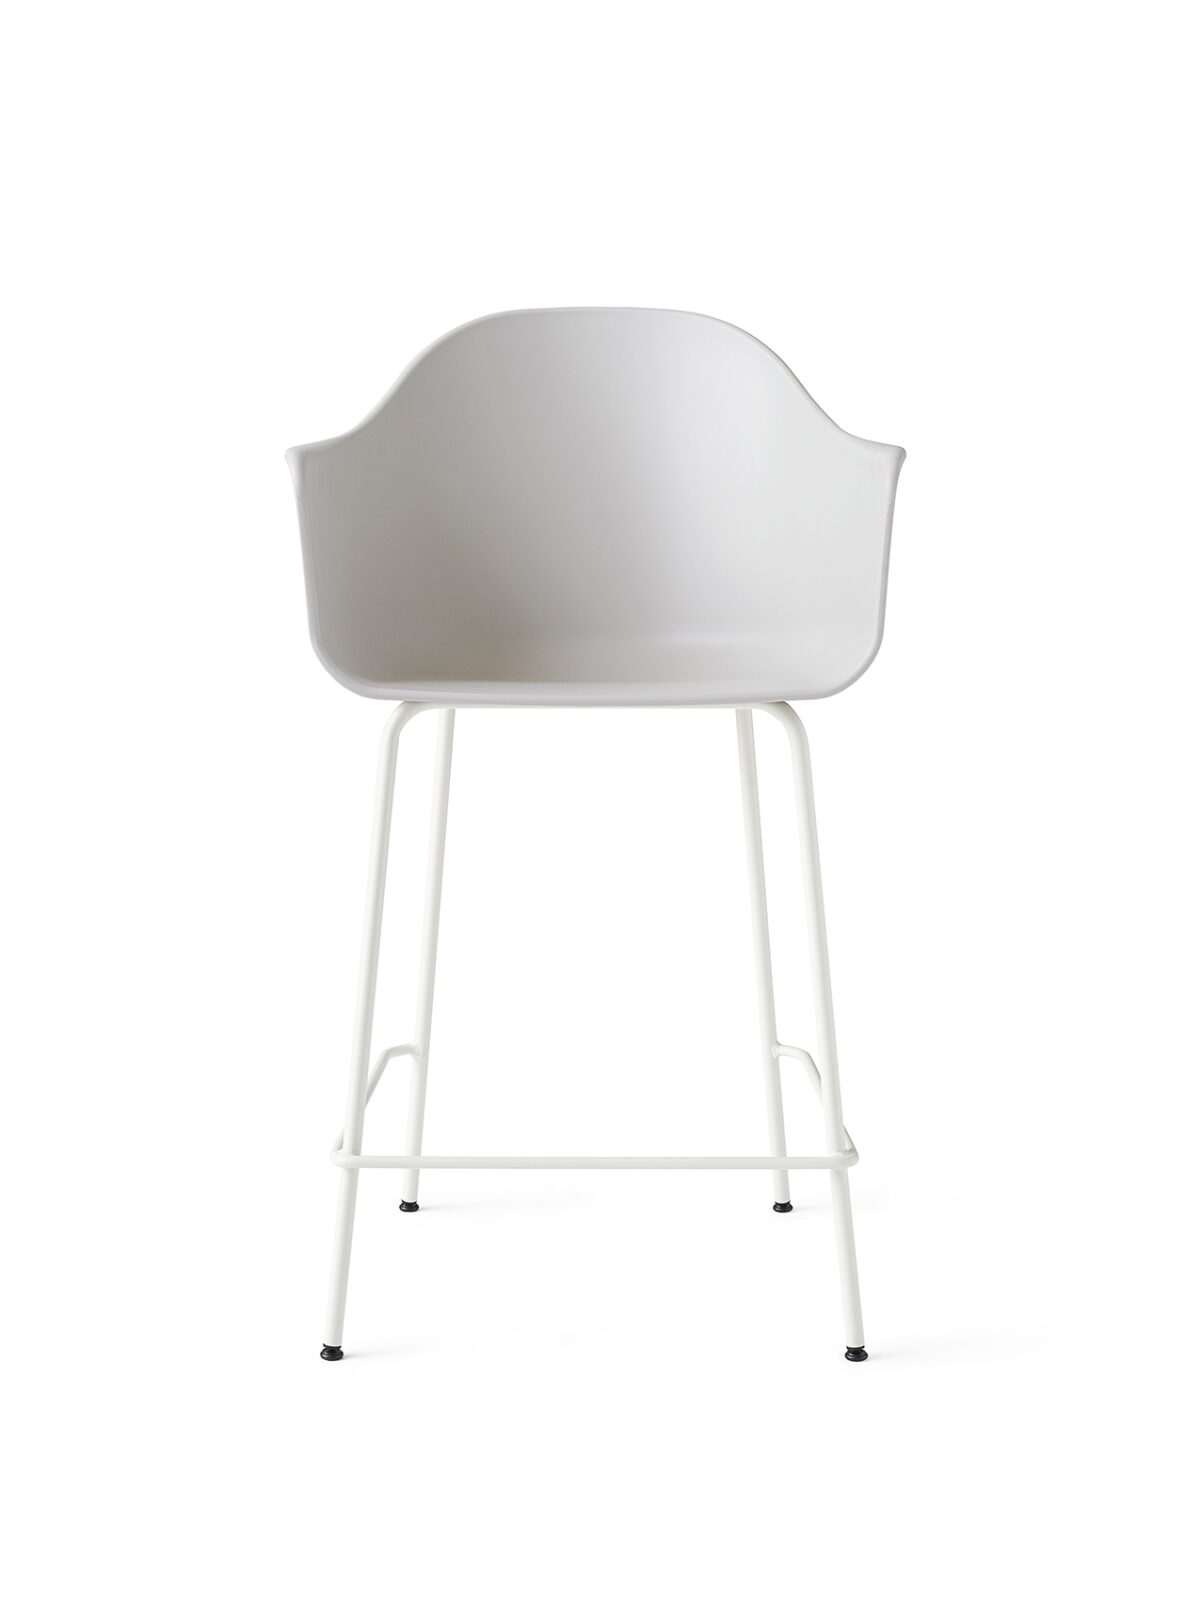 9361640 Harbour Chair Counter LightGrey LightGrey Front